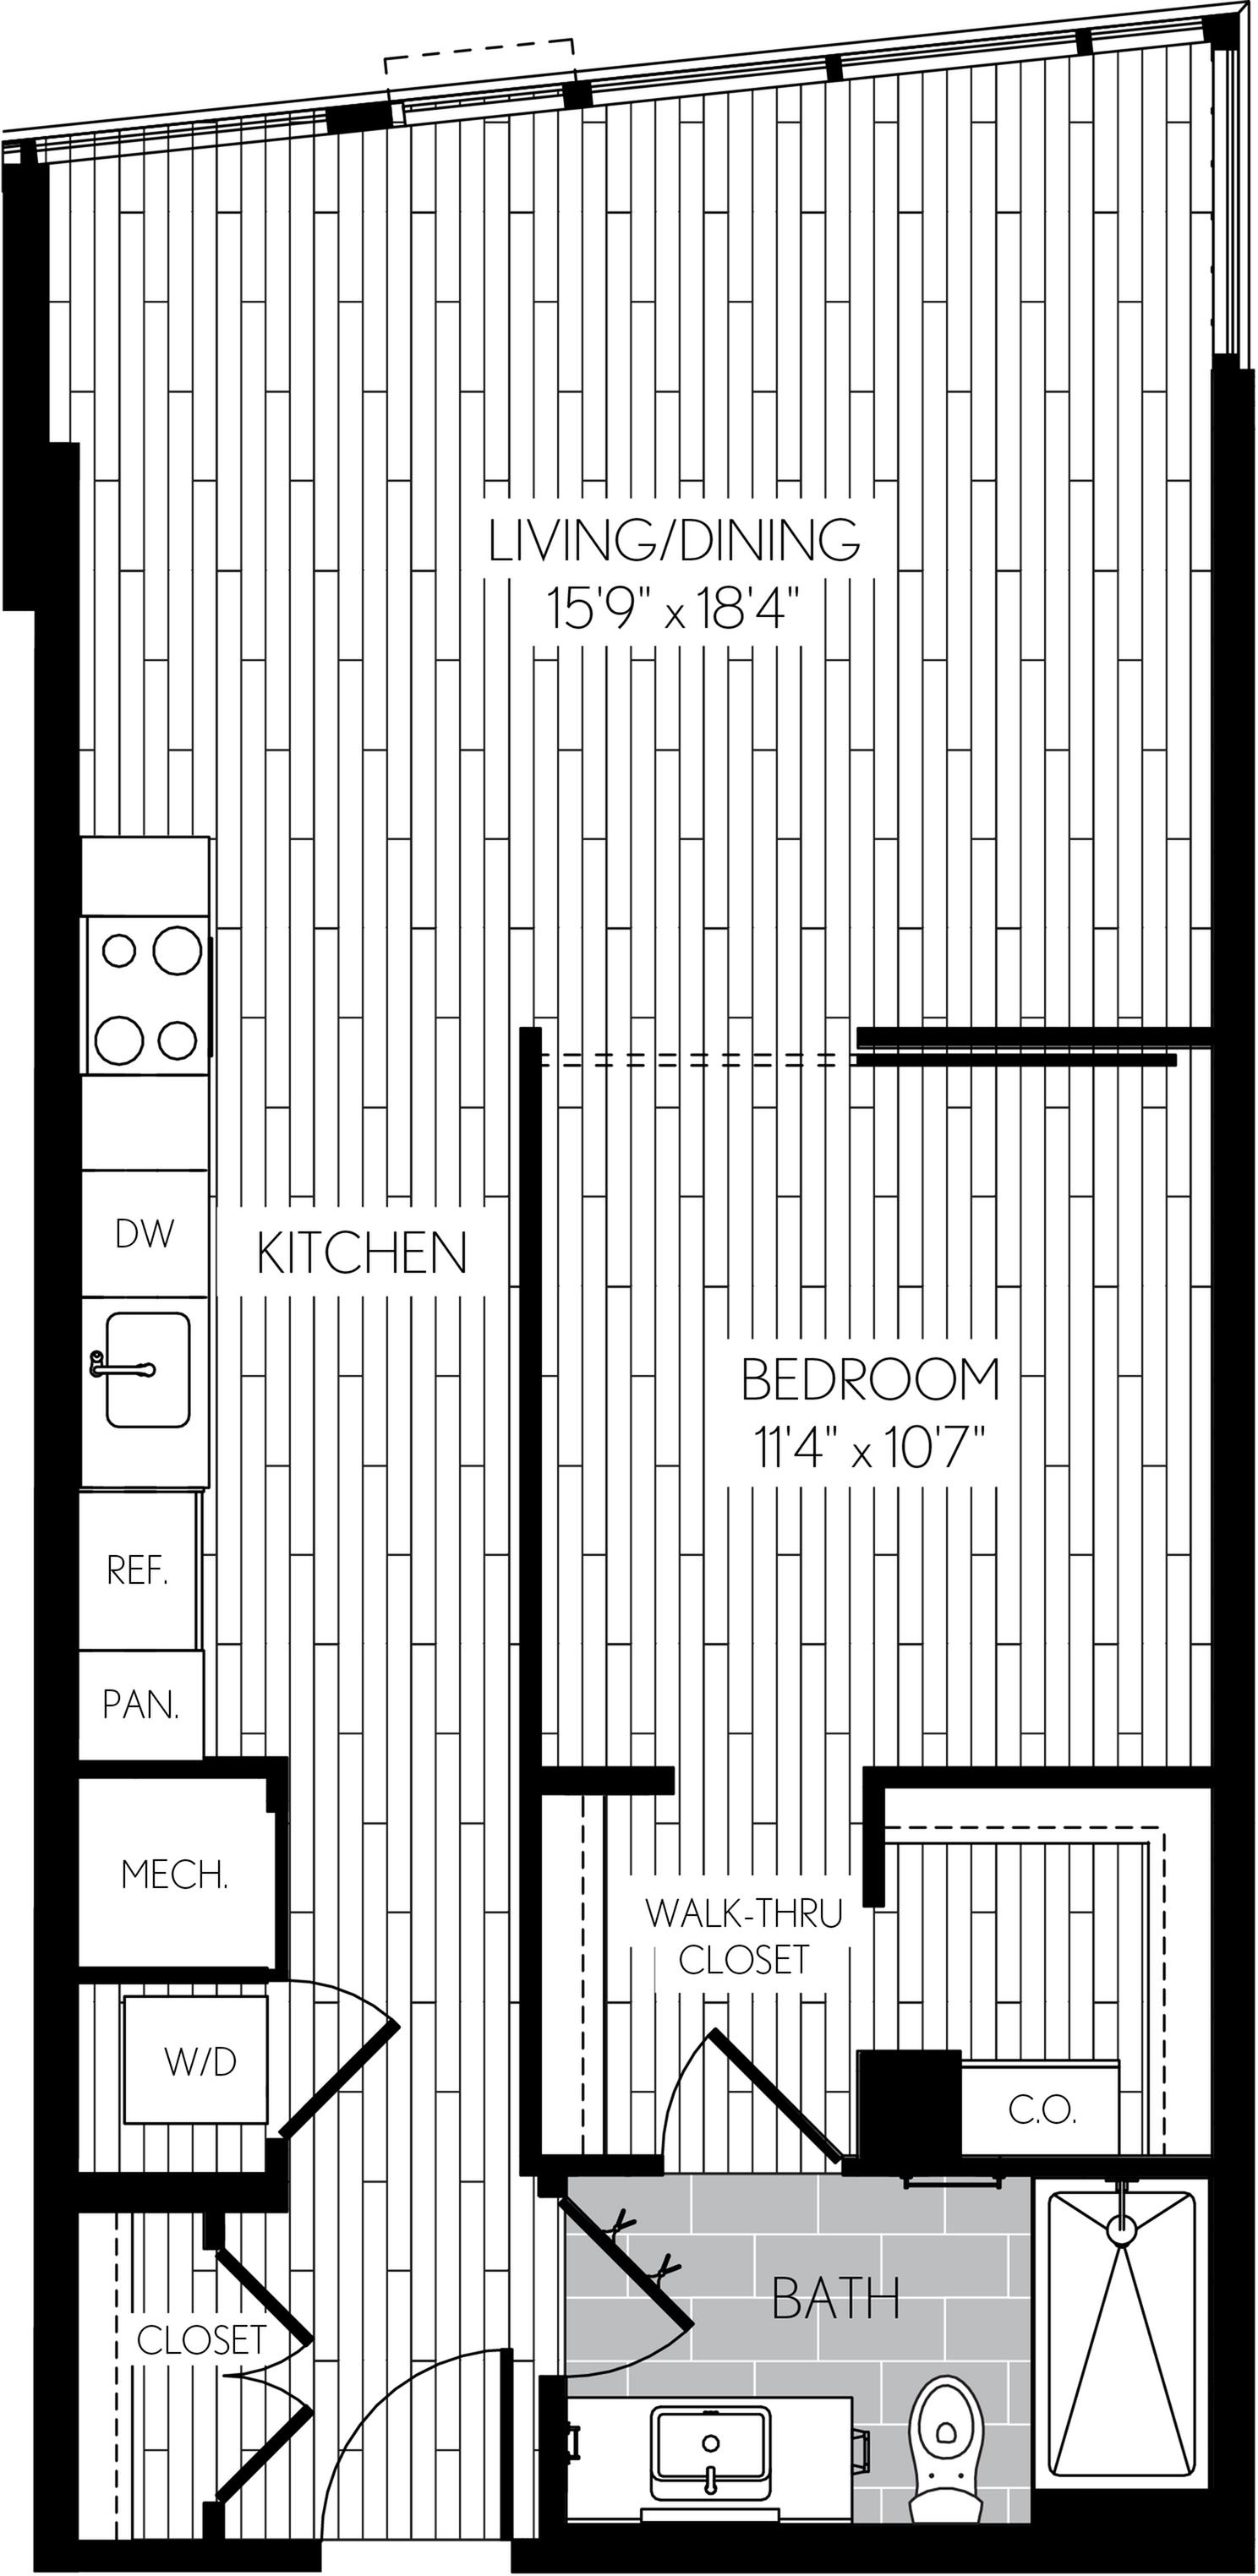 744 square foot one bedroom one bath apartment floorplan image